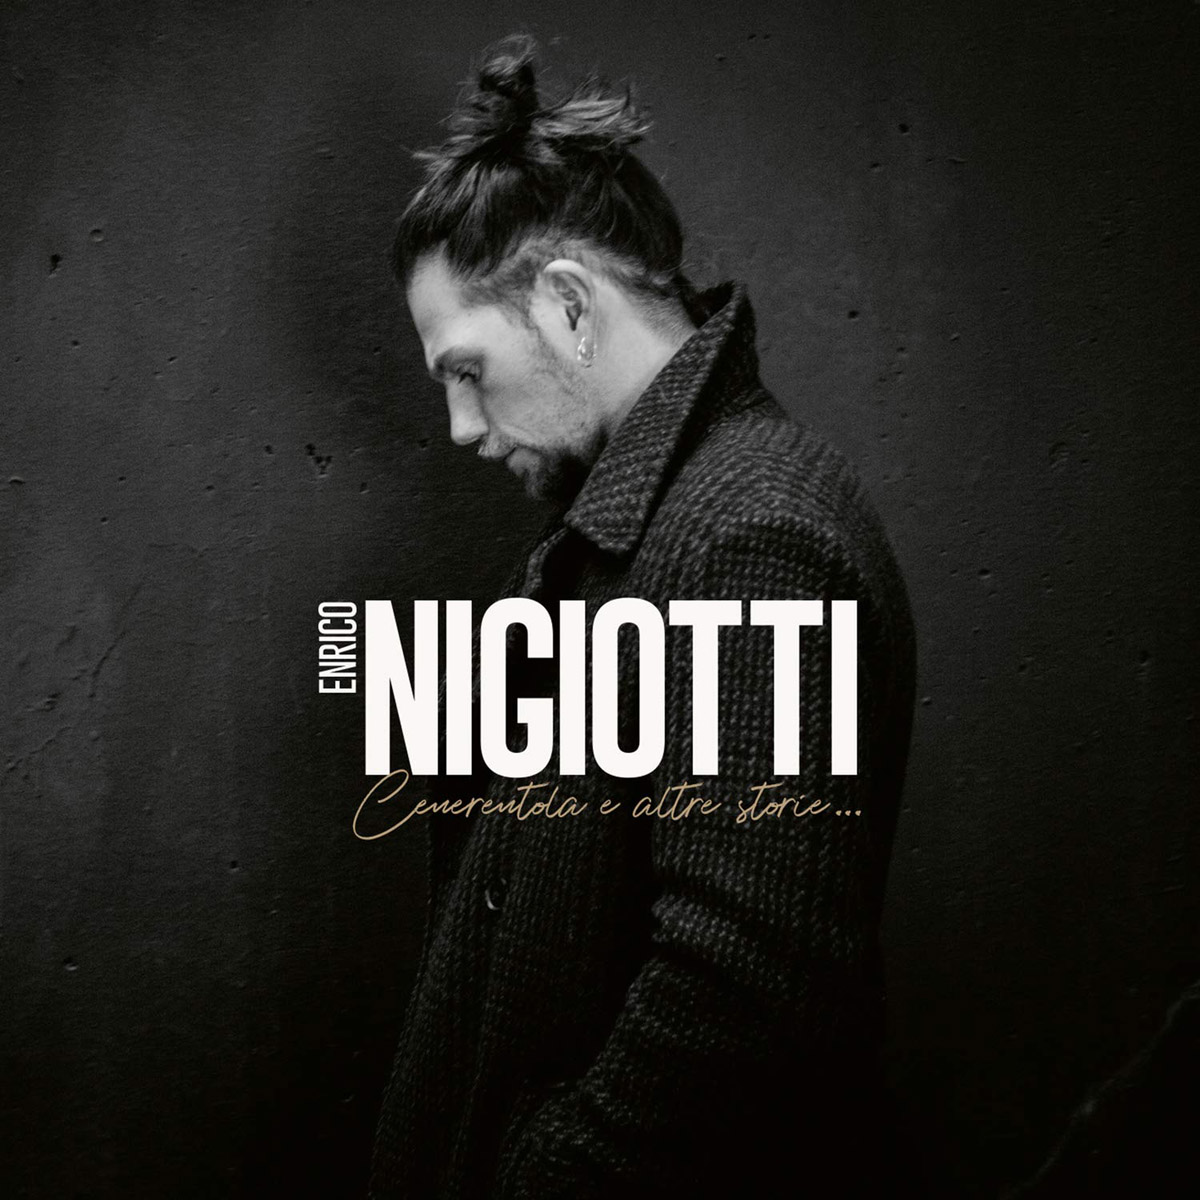 Enrico Nigiotti Enrico Nigiotti. Cenerentola E Altre Storie... enrico giuseppe dapei donne